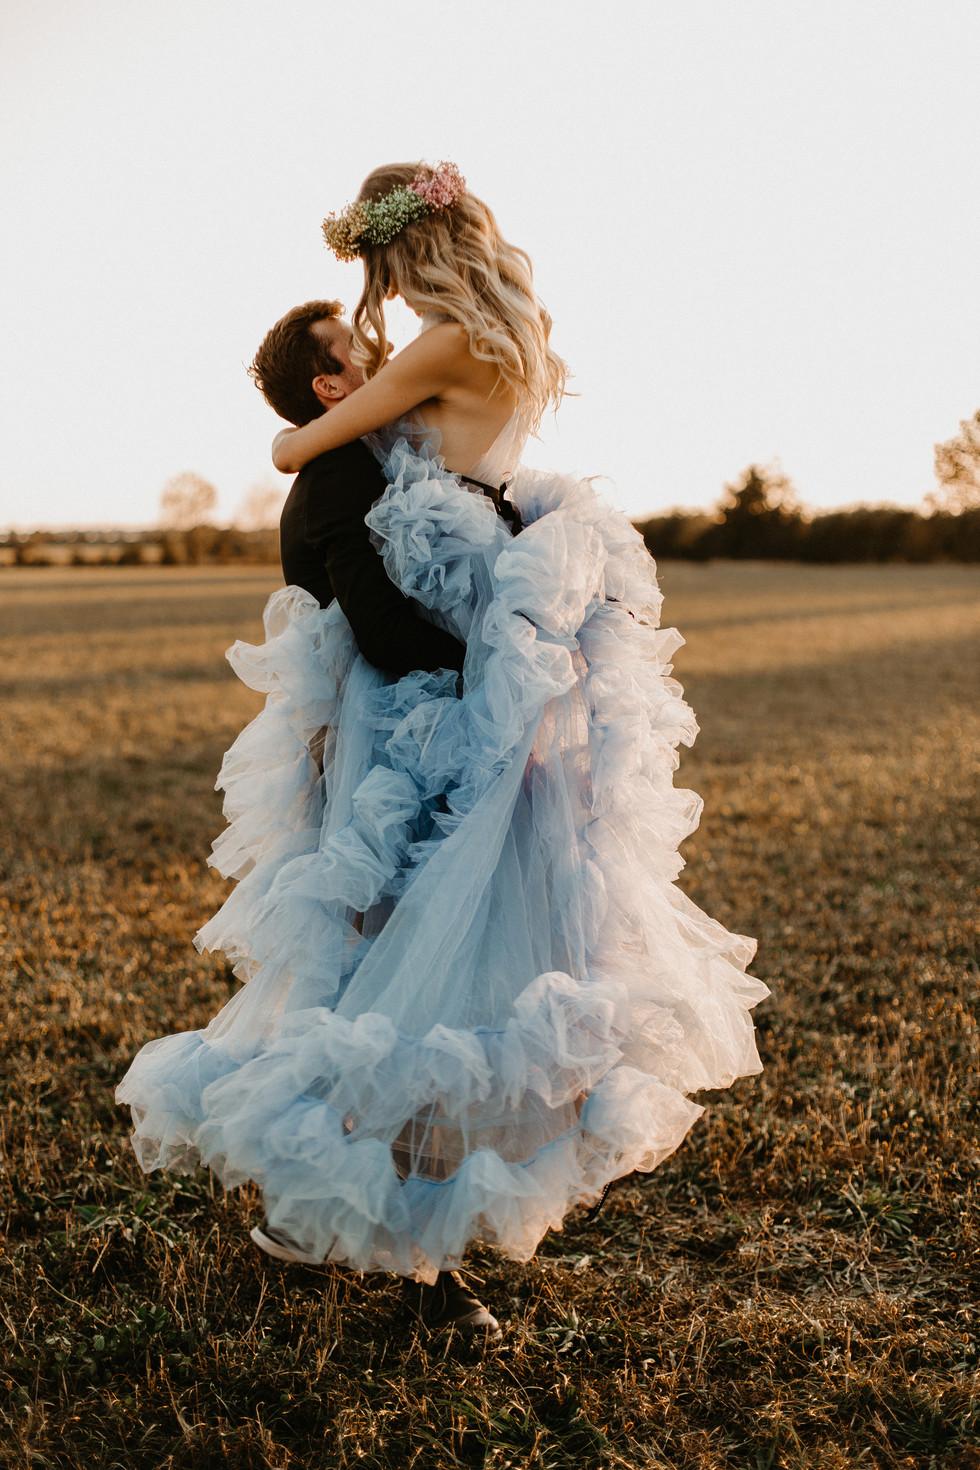 Taylor Swift inspired wedding